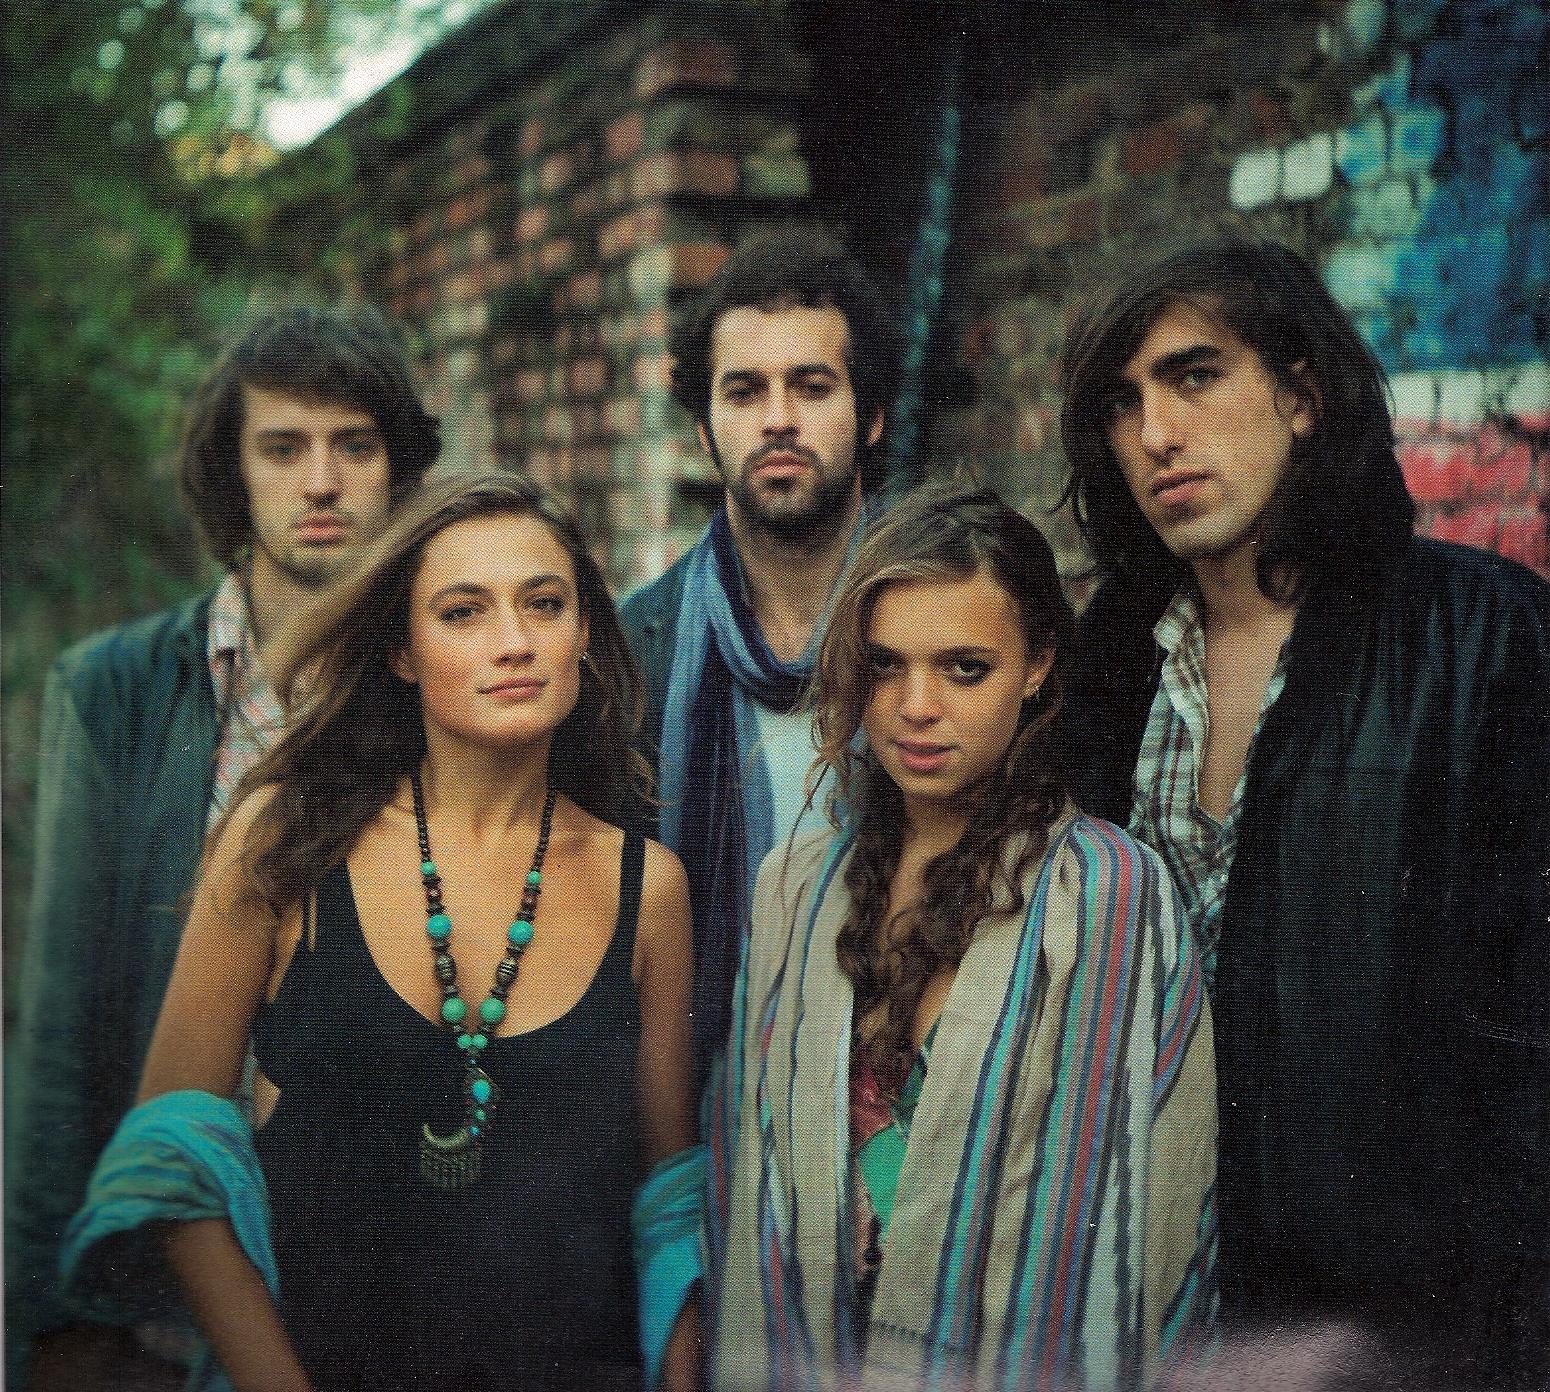 Crystal Fighters como hippies